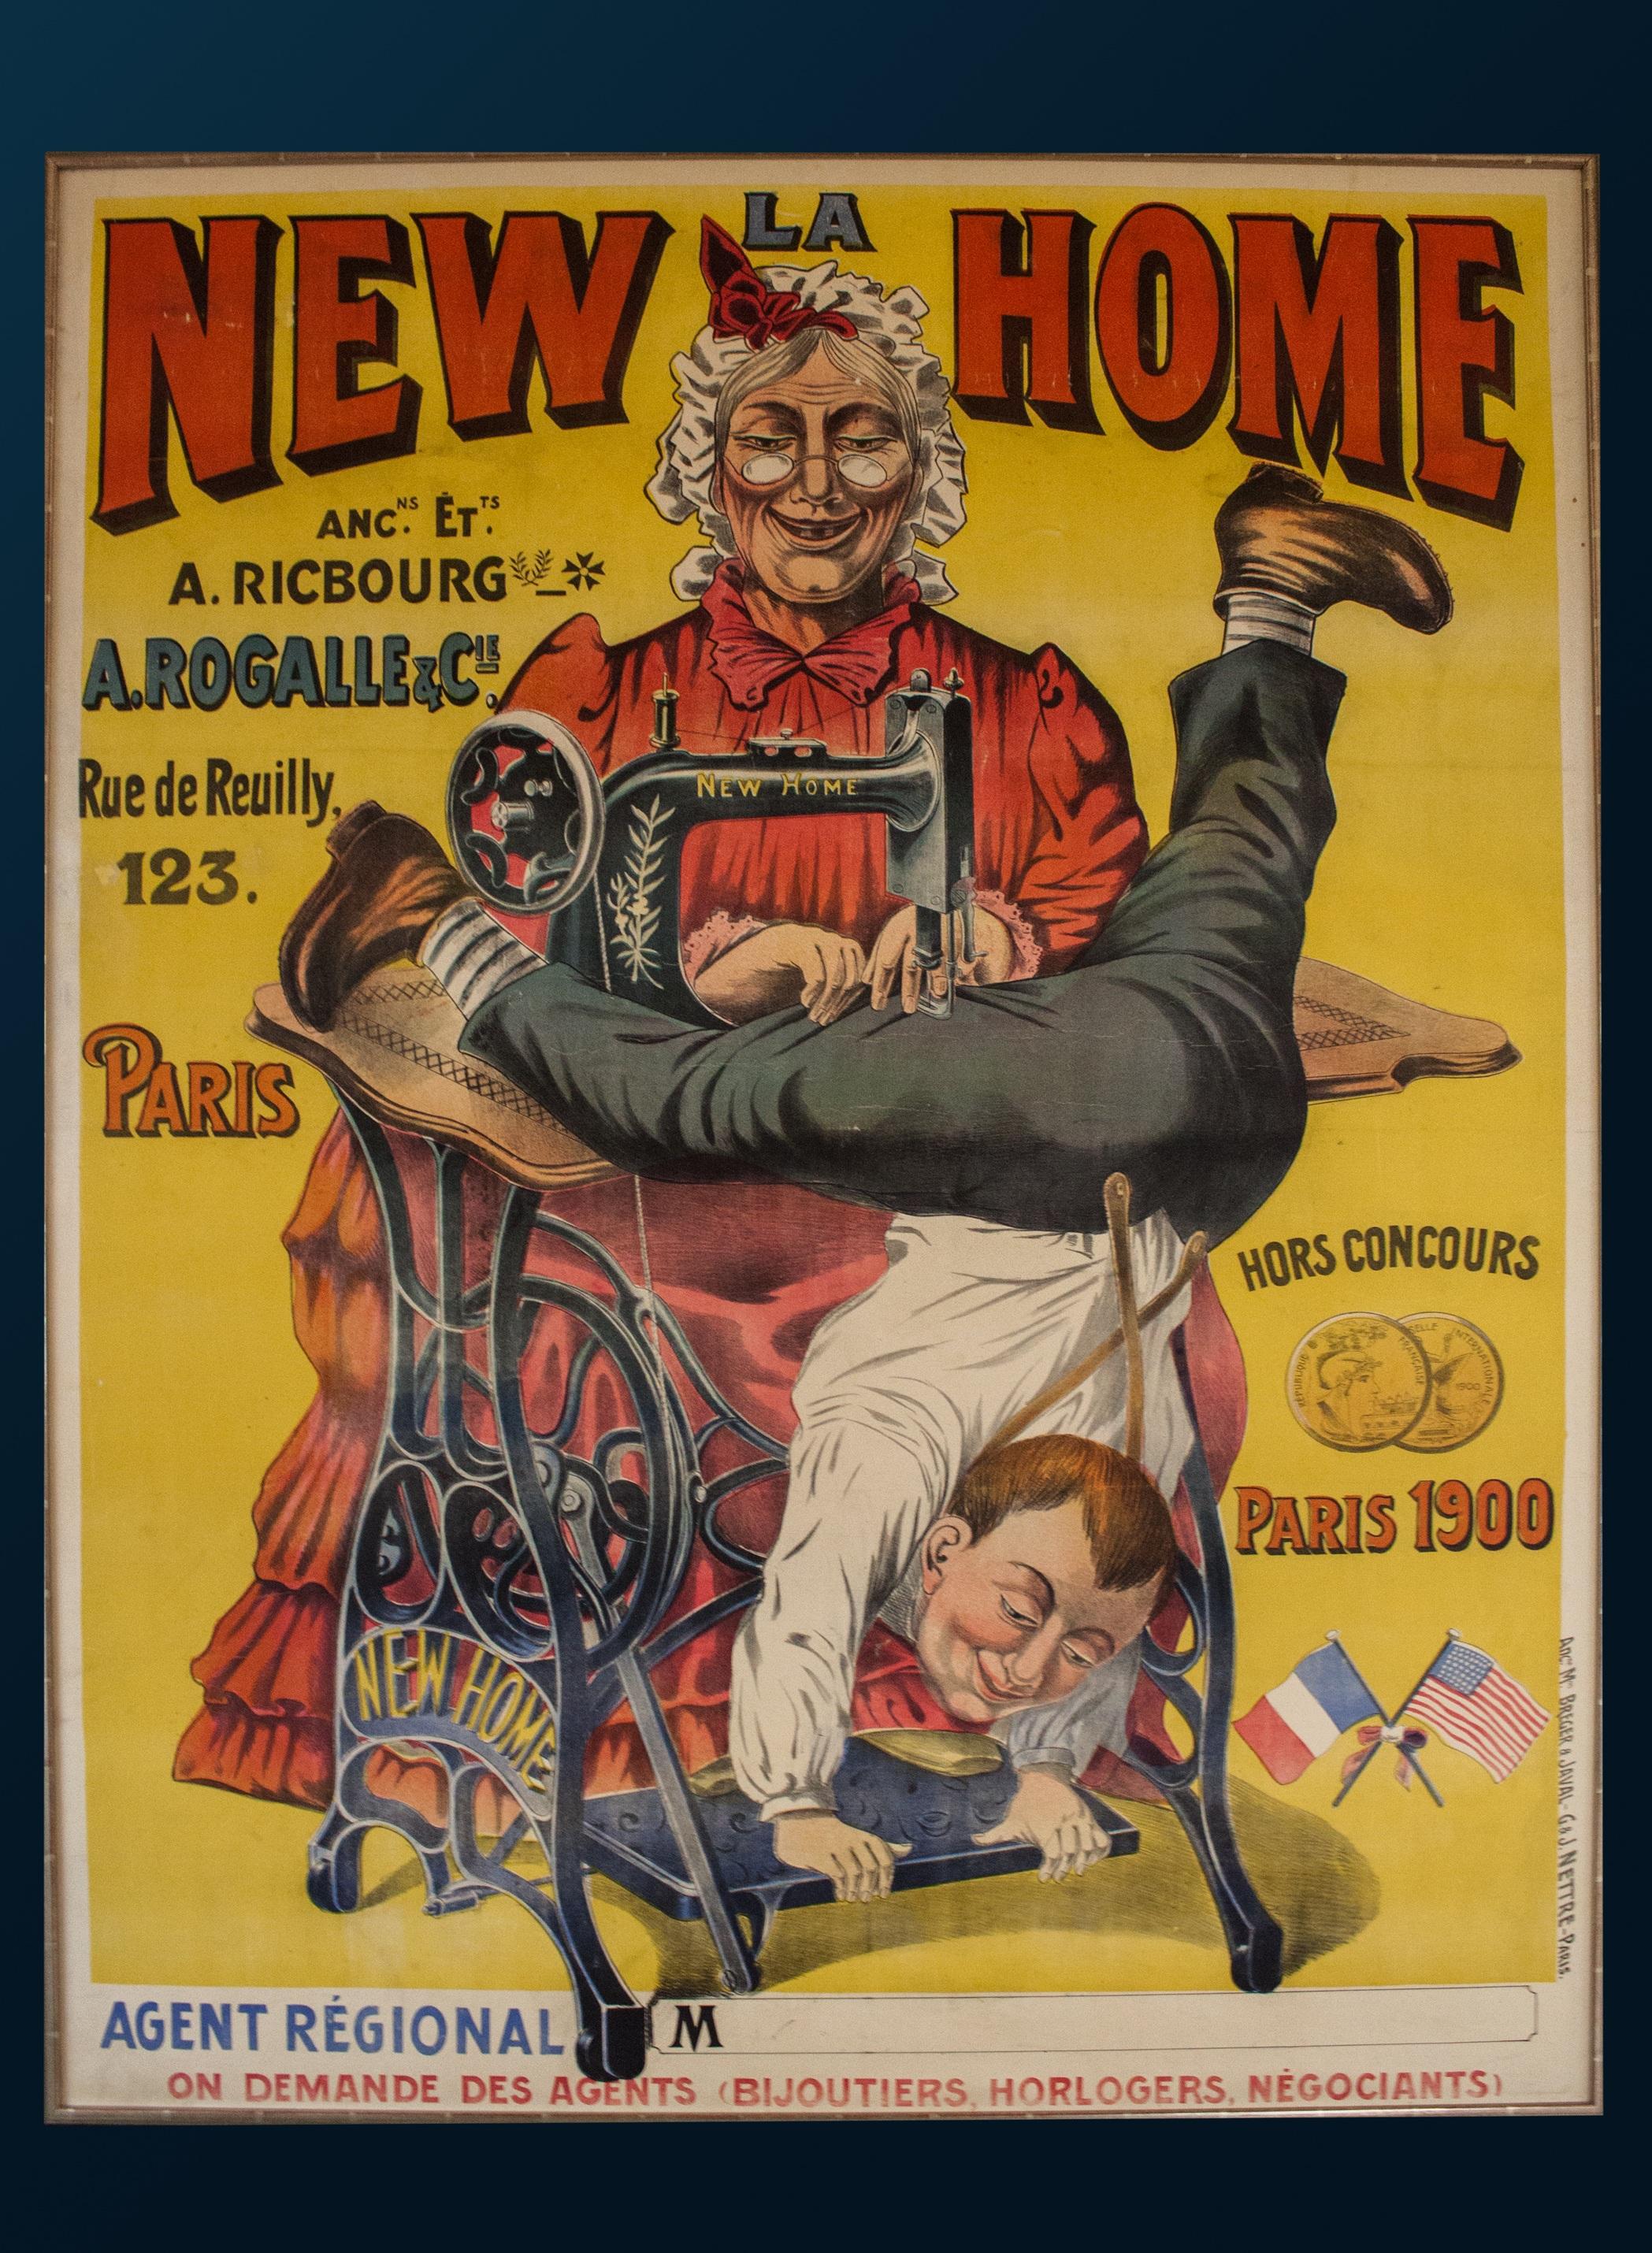 Gambar Vintage Tua Iklan Warna Warni Fiksi Iklan Poster